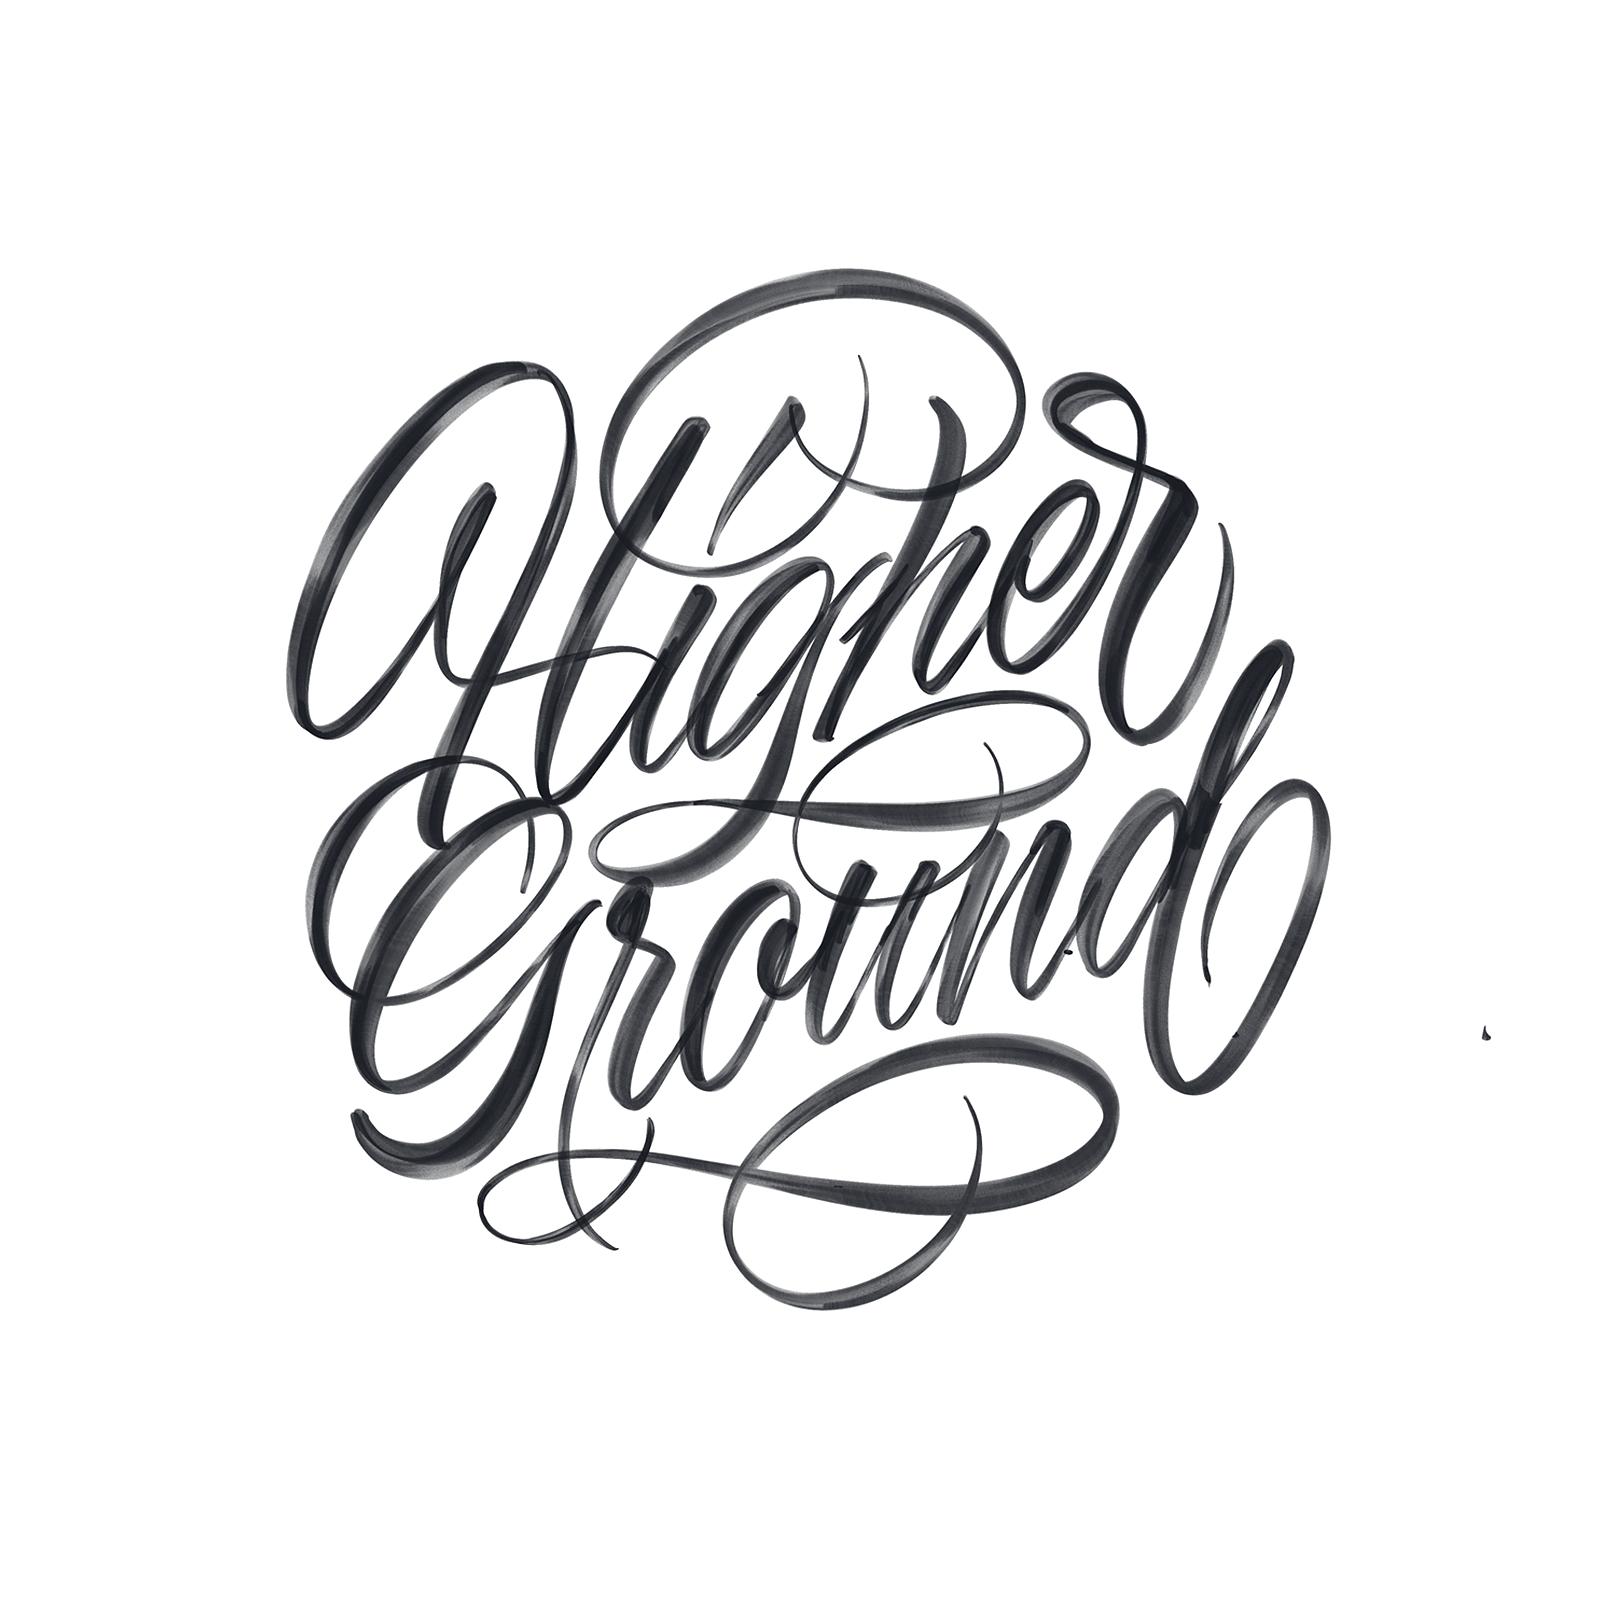 HigherGround_MichaelMoodie2019.png